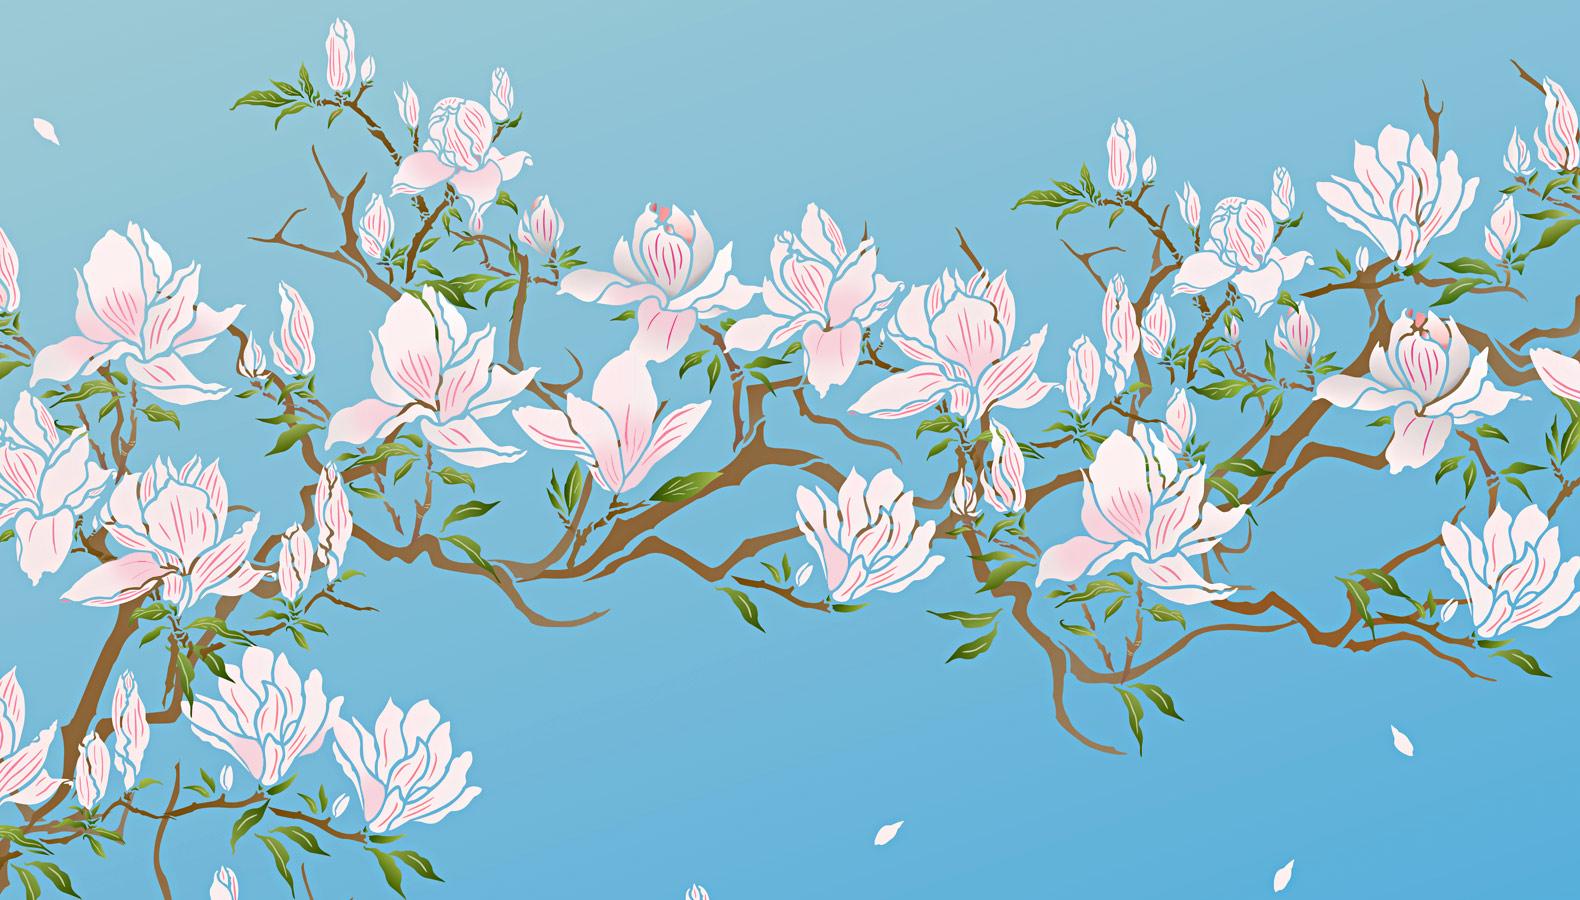 Flowering Magnolia Tree Stencil Design Inspirations Henny